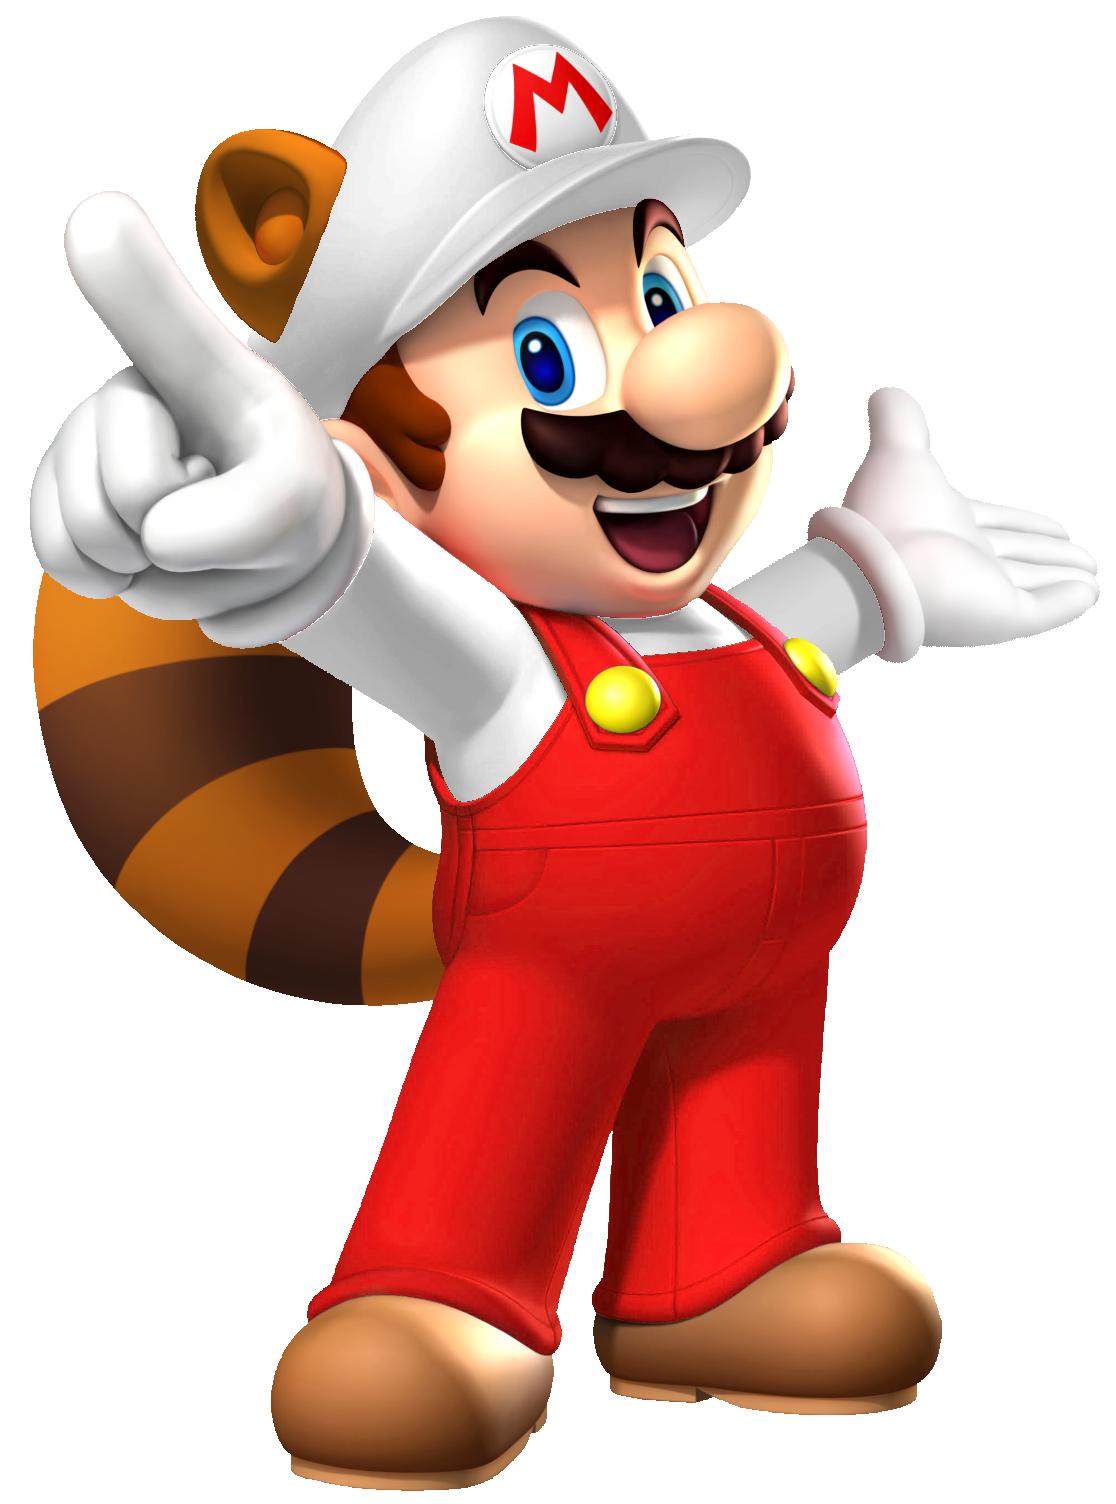 super-mario-06.png (1116×1504) | Super Mario Bros | Pinterest